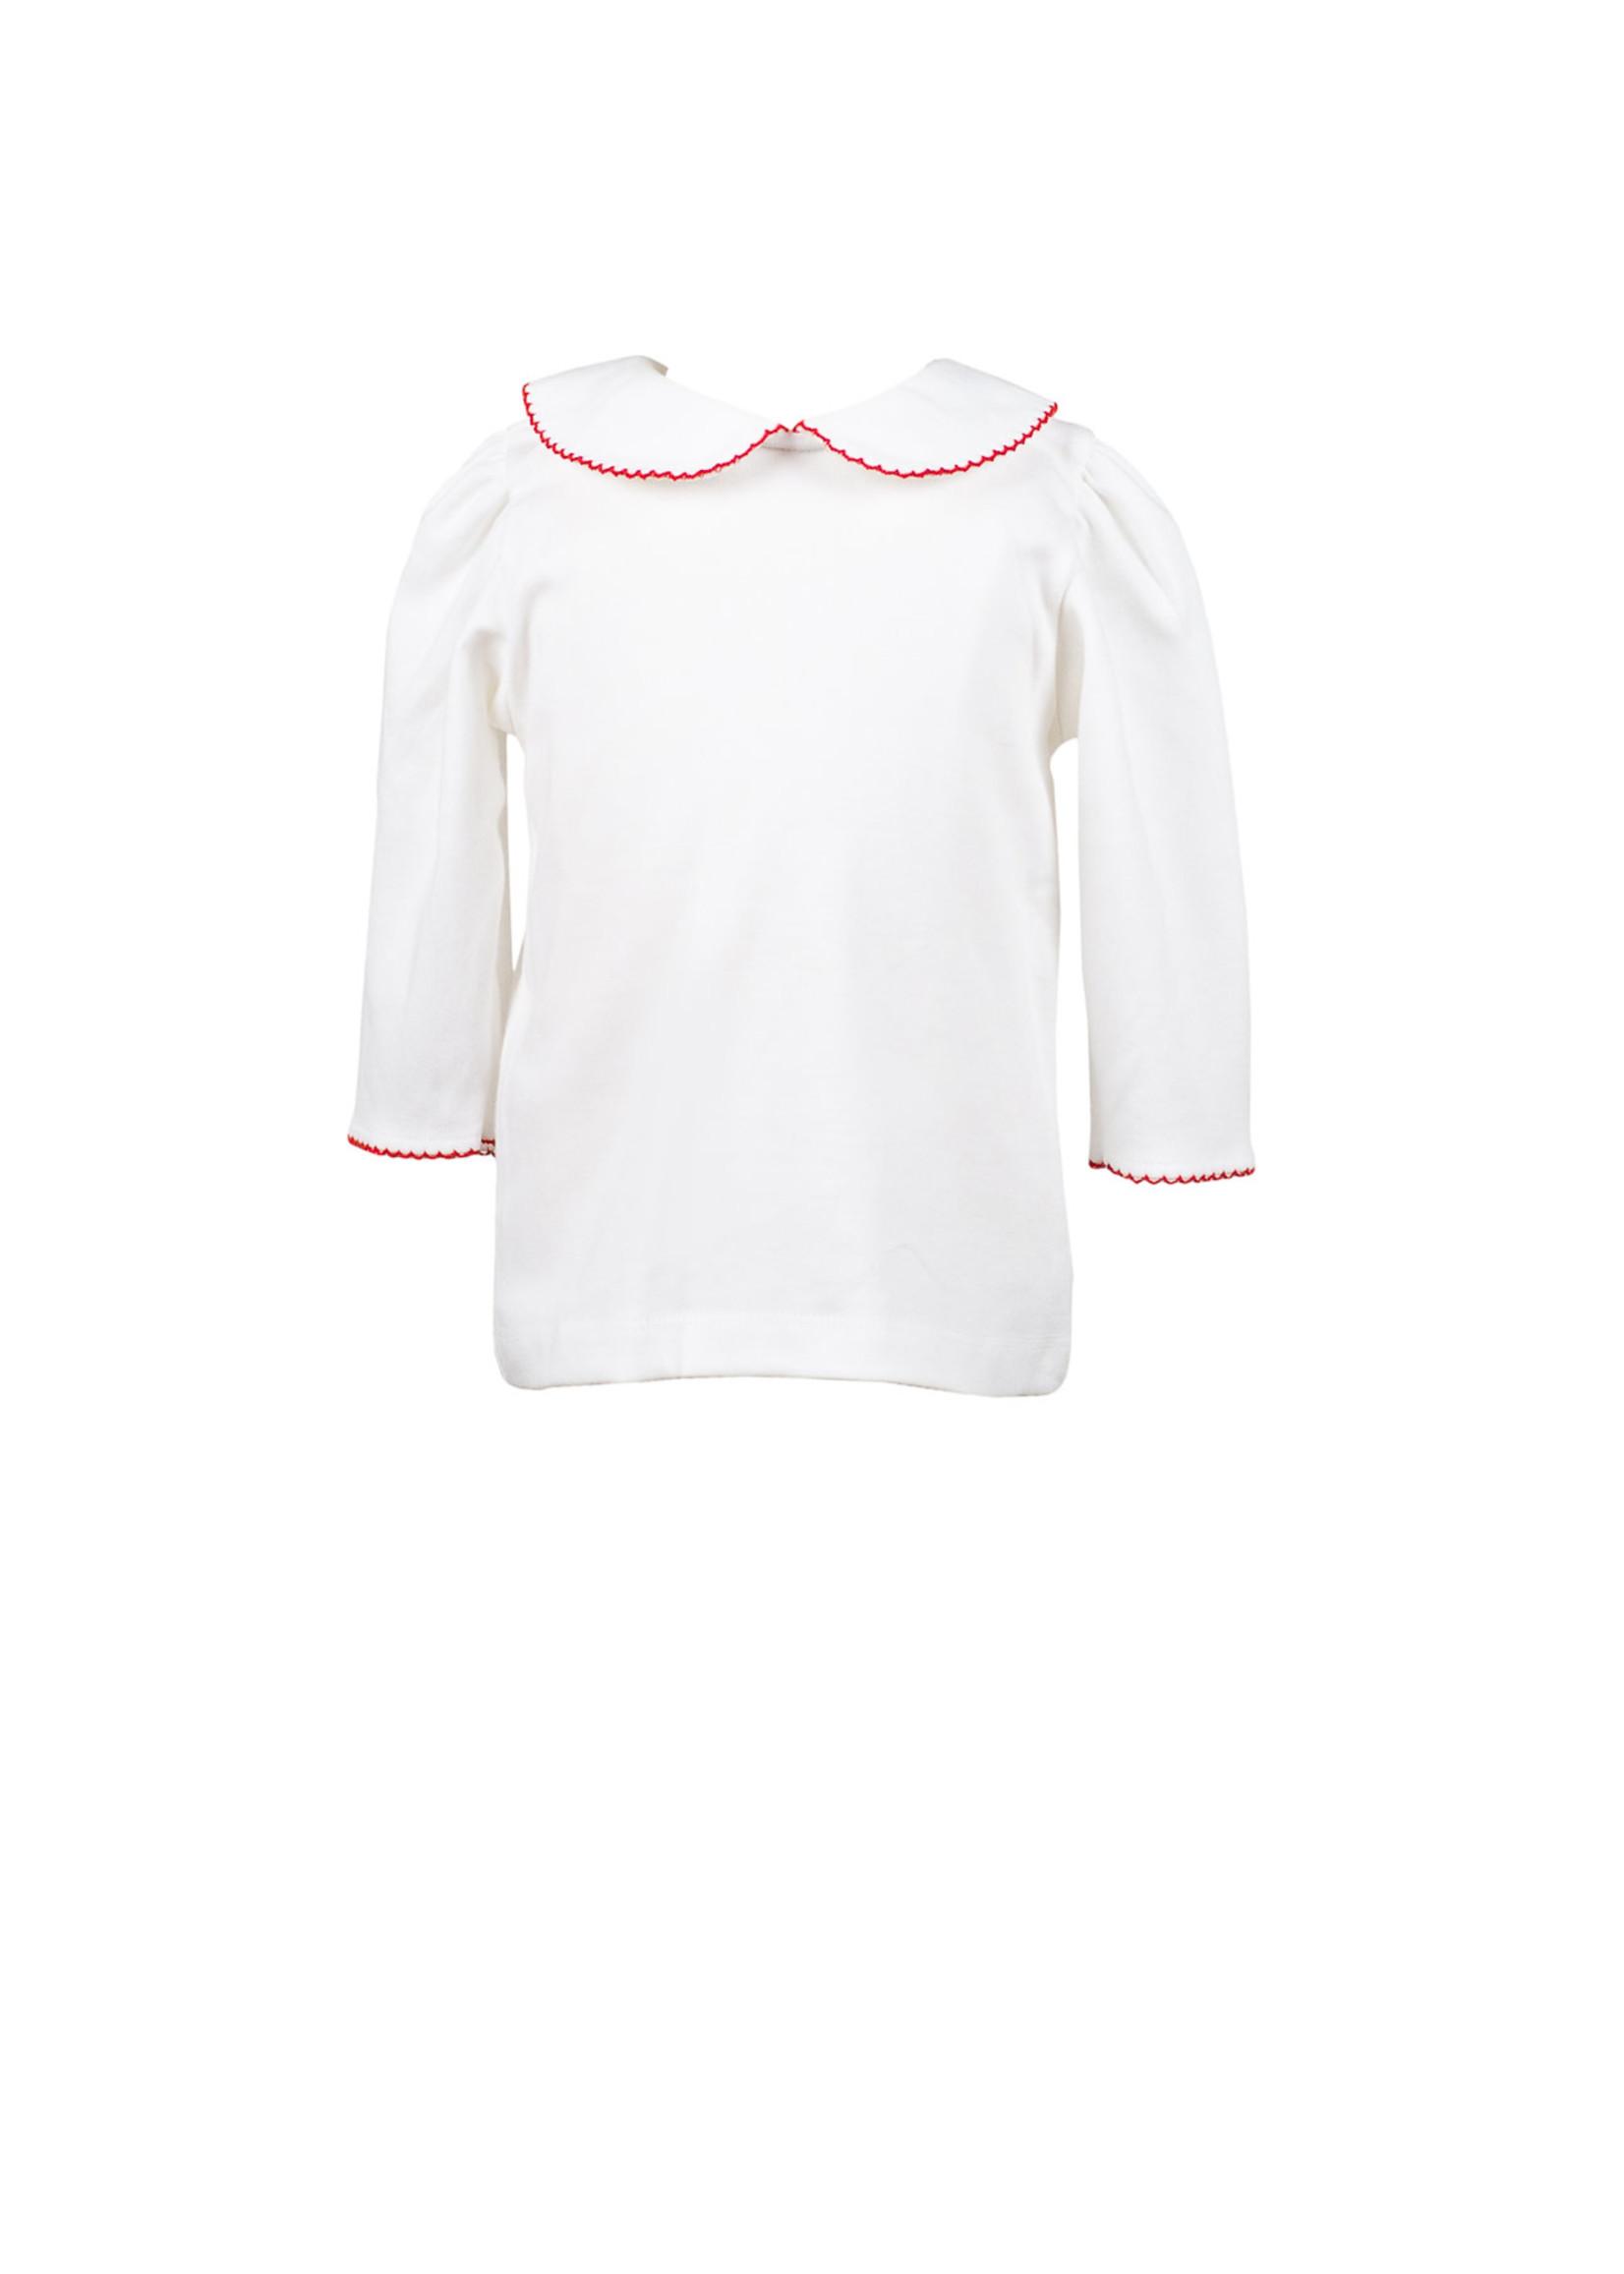 Proper Peony White Knit 3/4 Shirt w/ Trim